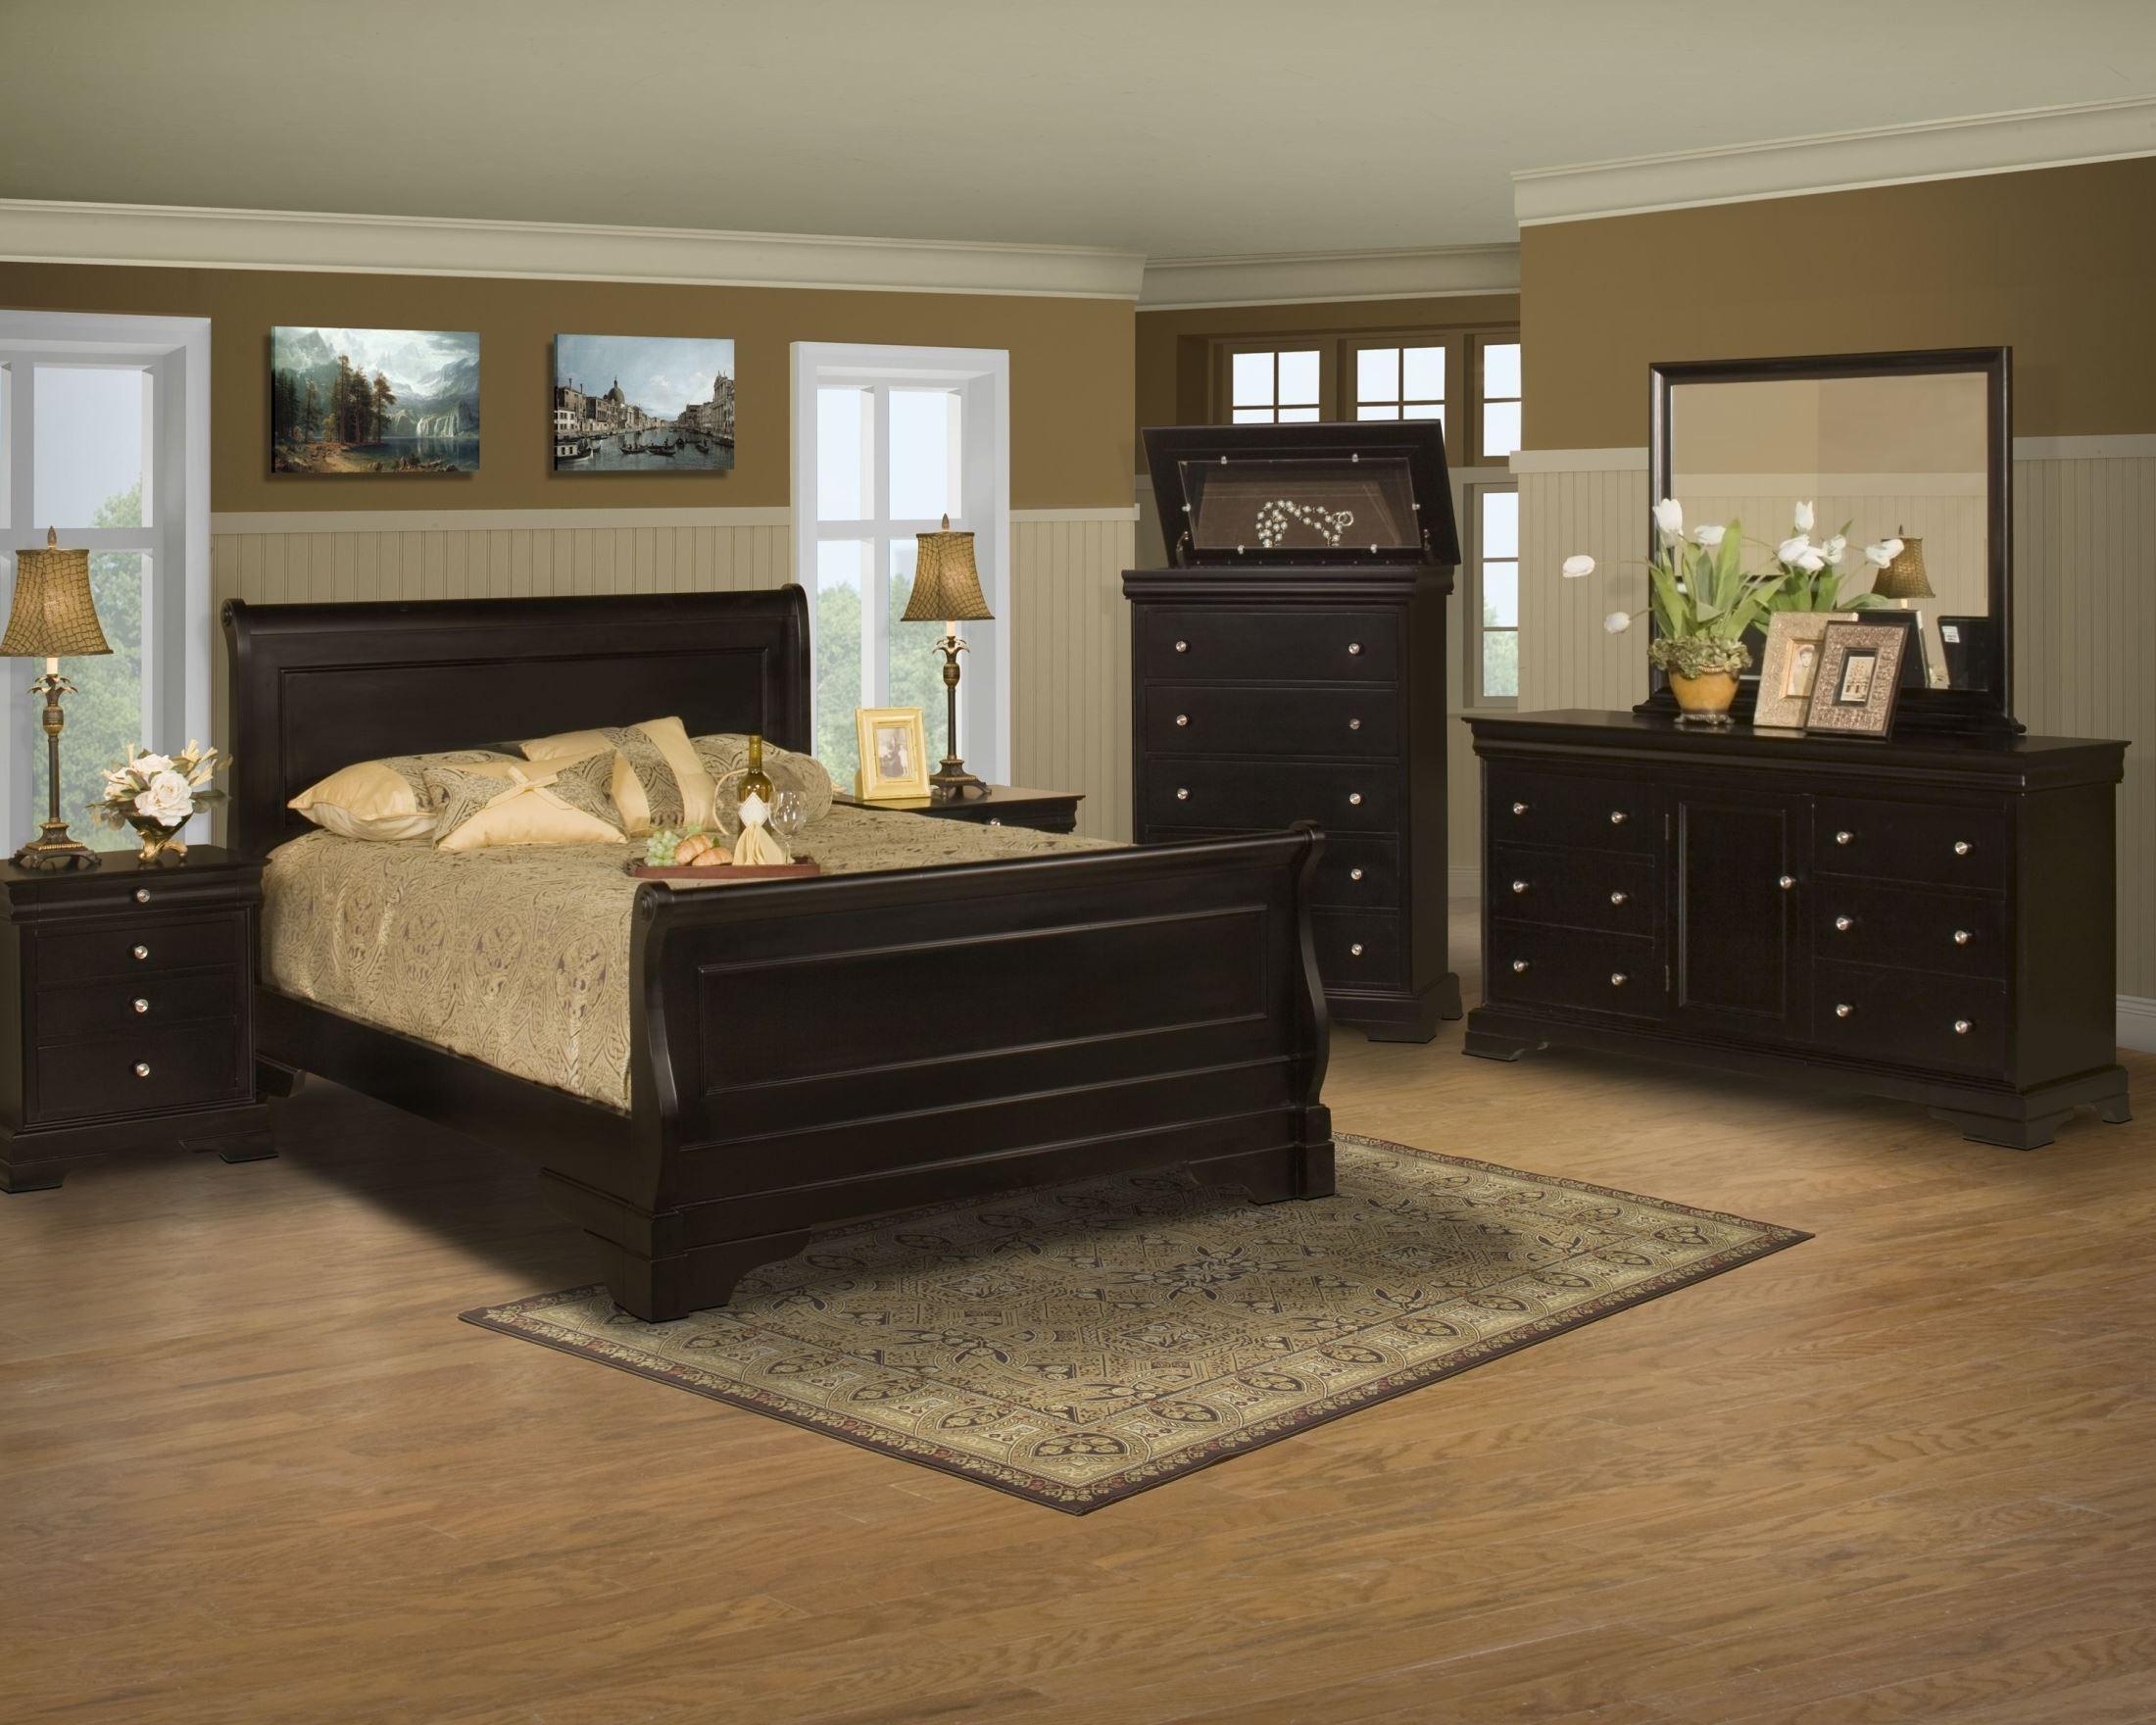 belle rose black cherry sleigh bedroom set from new bedroom furniture sets black bedroom sets sleigh beds